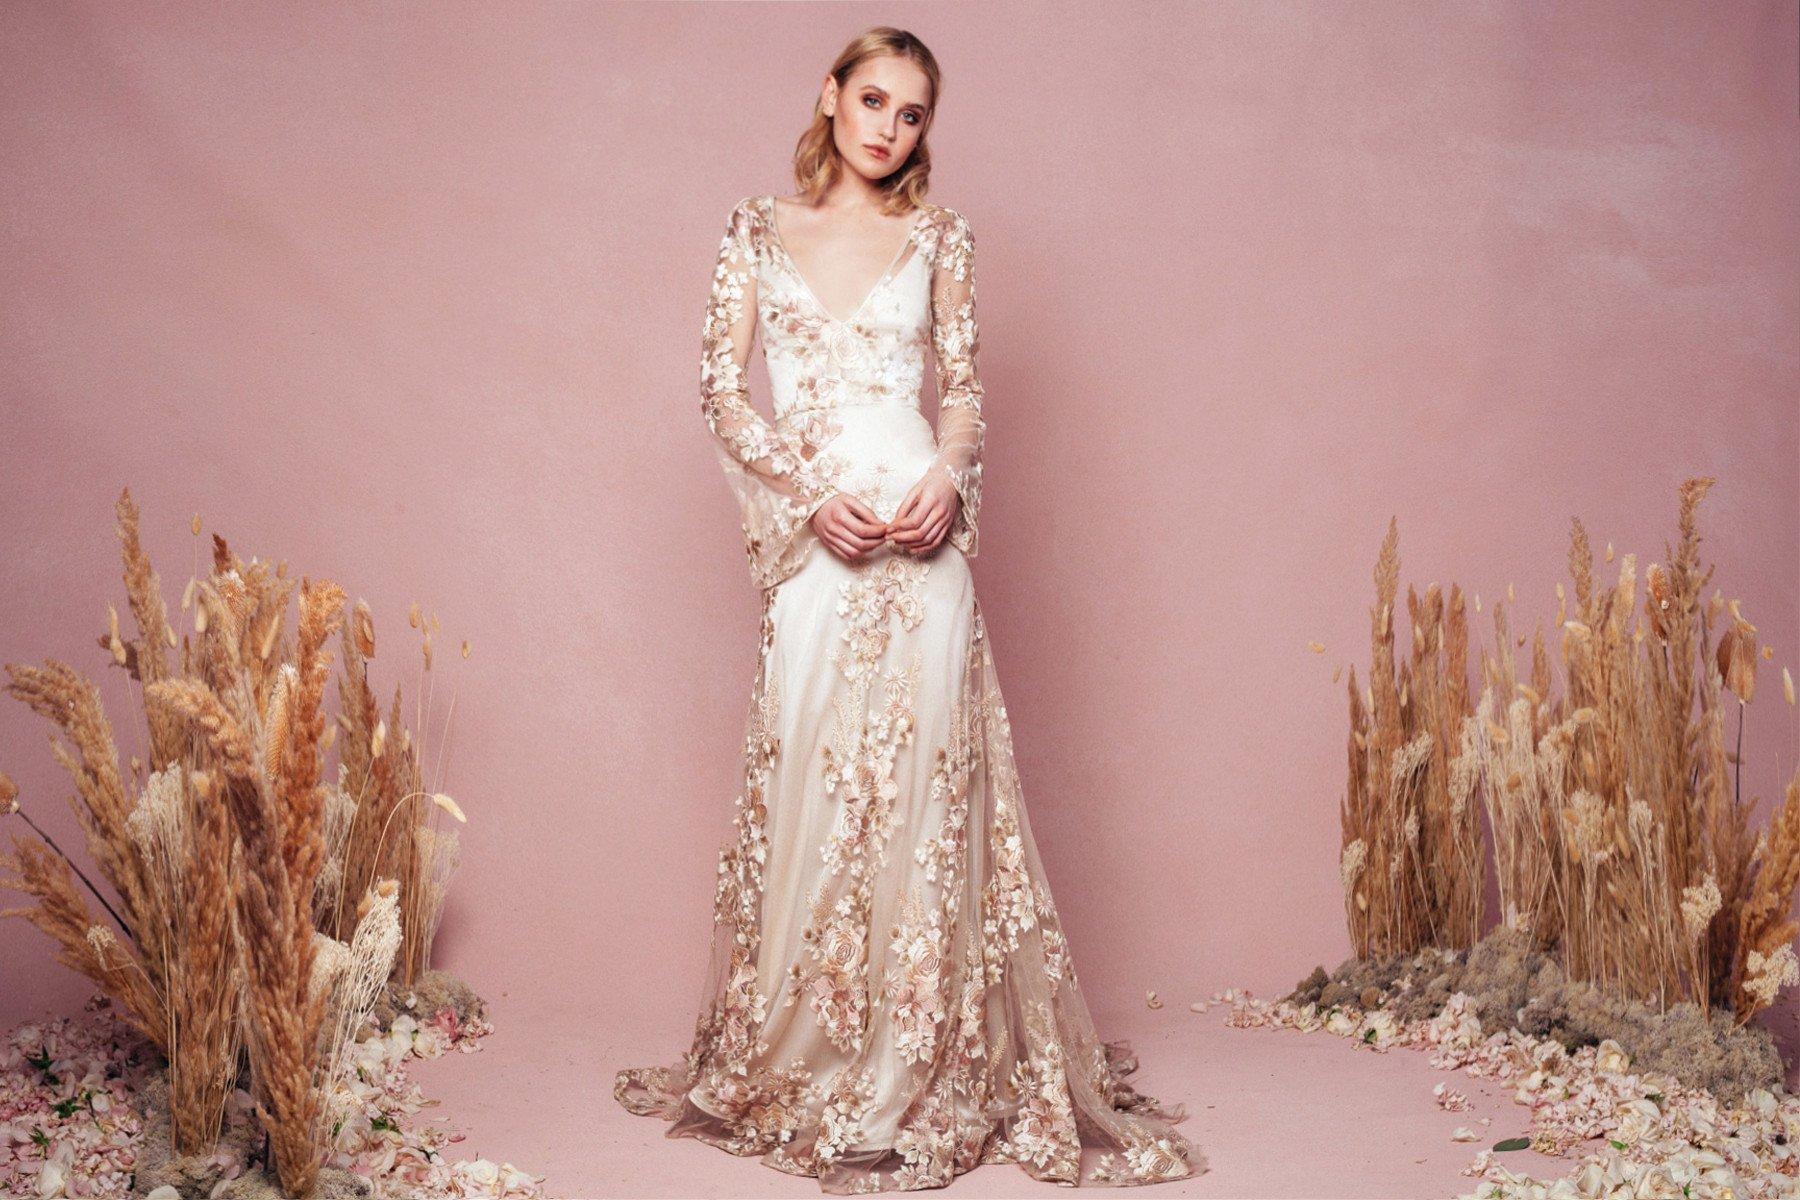 My Dream Wedding Dress Shopping Guide